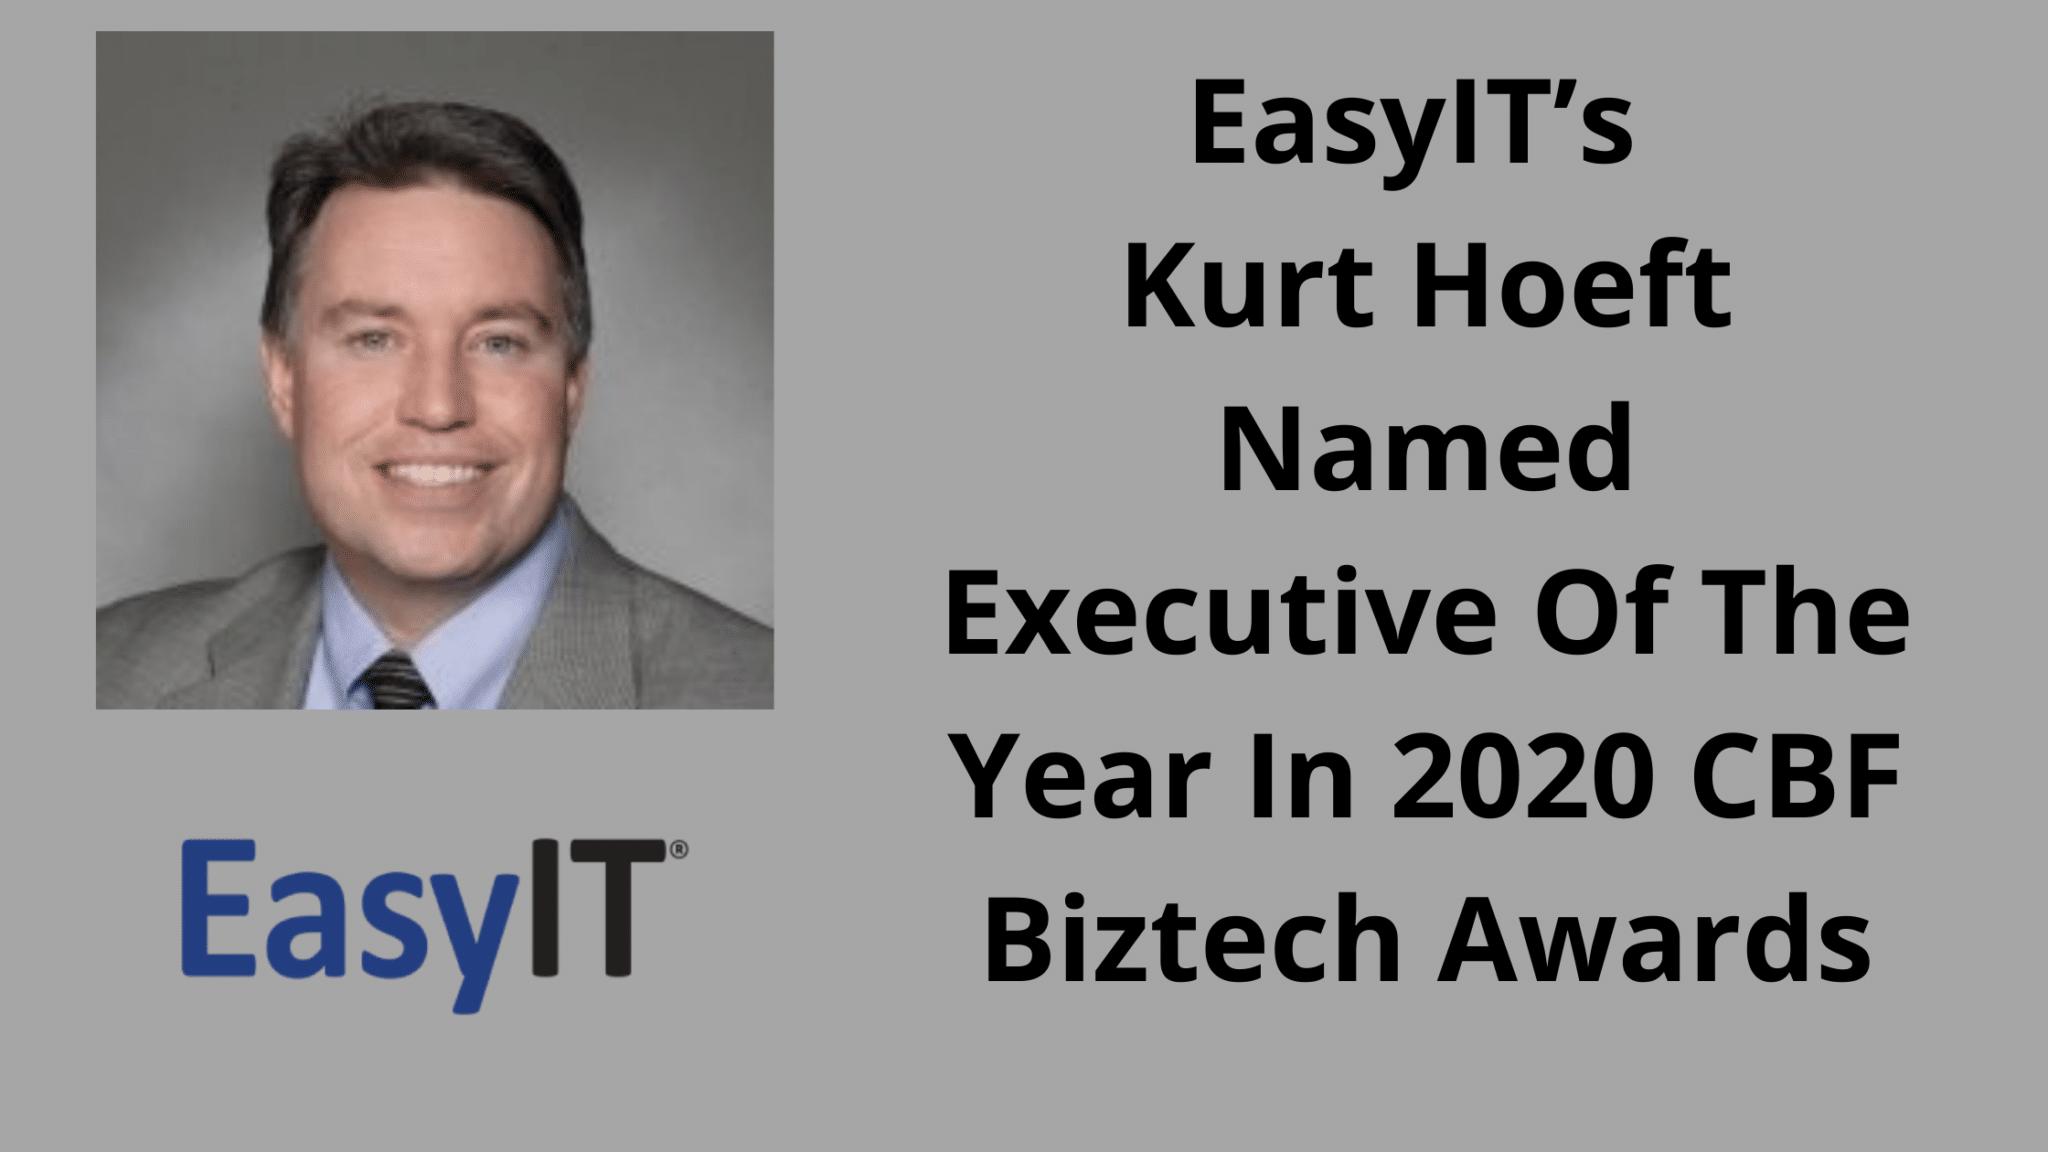 EasyIT's Kurt Hoeft Named Executive Of The Year In 2020 CBF Biztech Awards